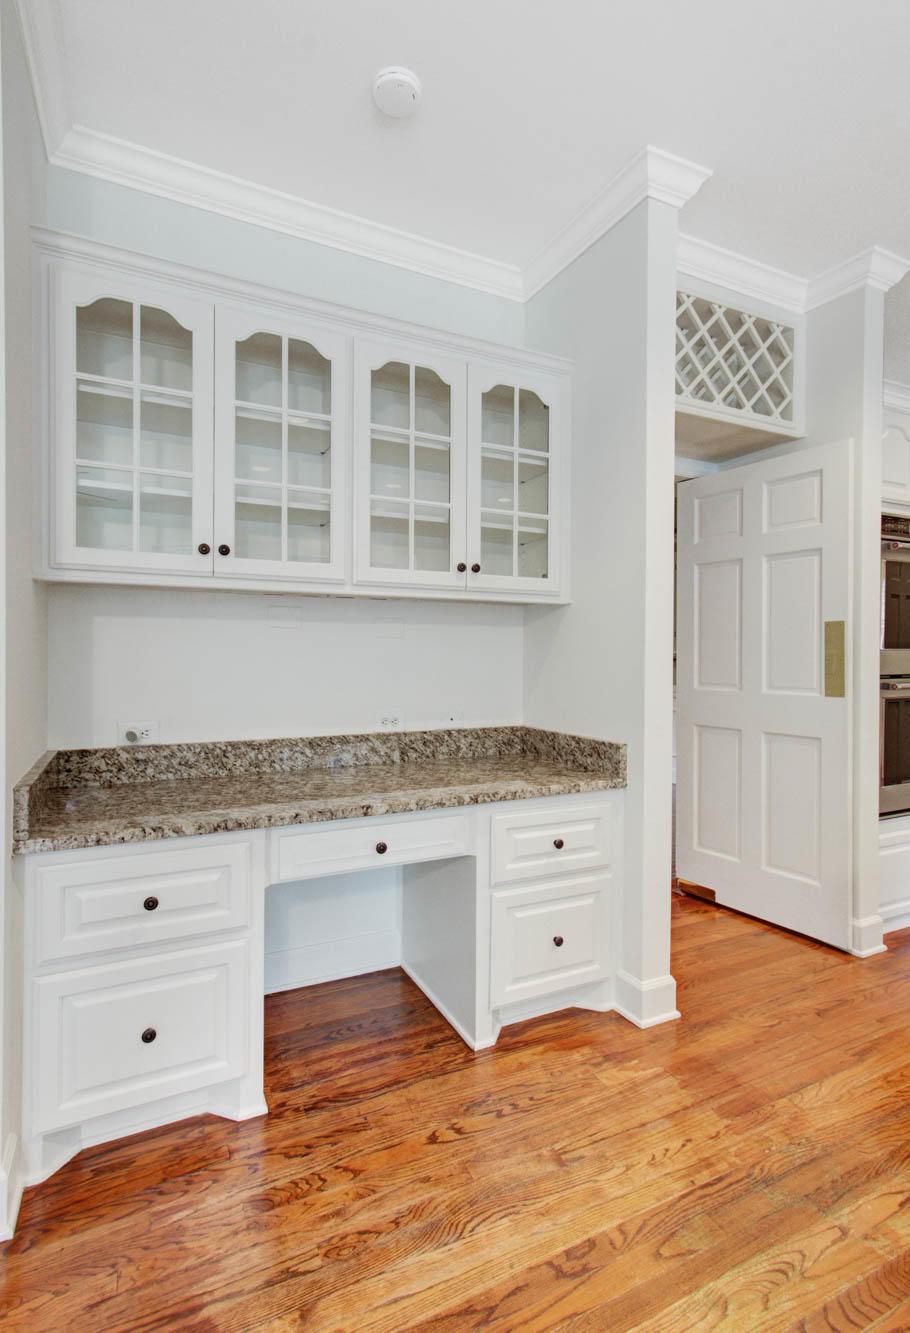 Dunes West Homes For Sale - 3515 Colonel Vanderhorst, Mount Pleasant, SC - 51